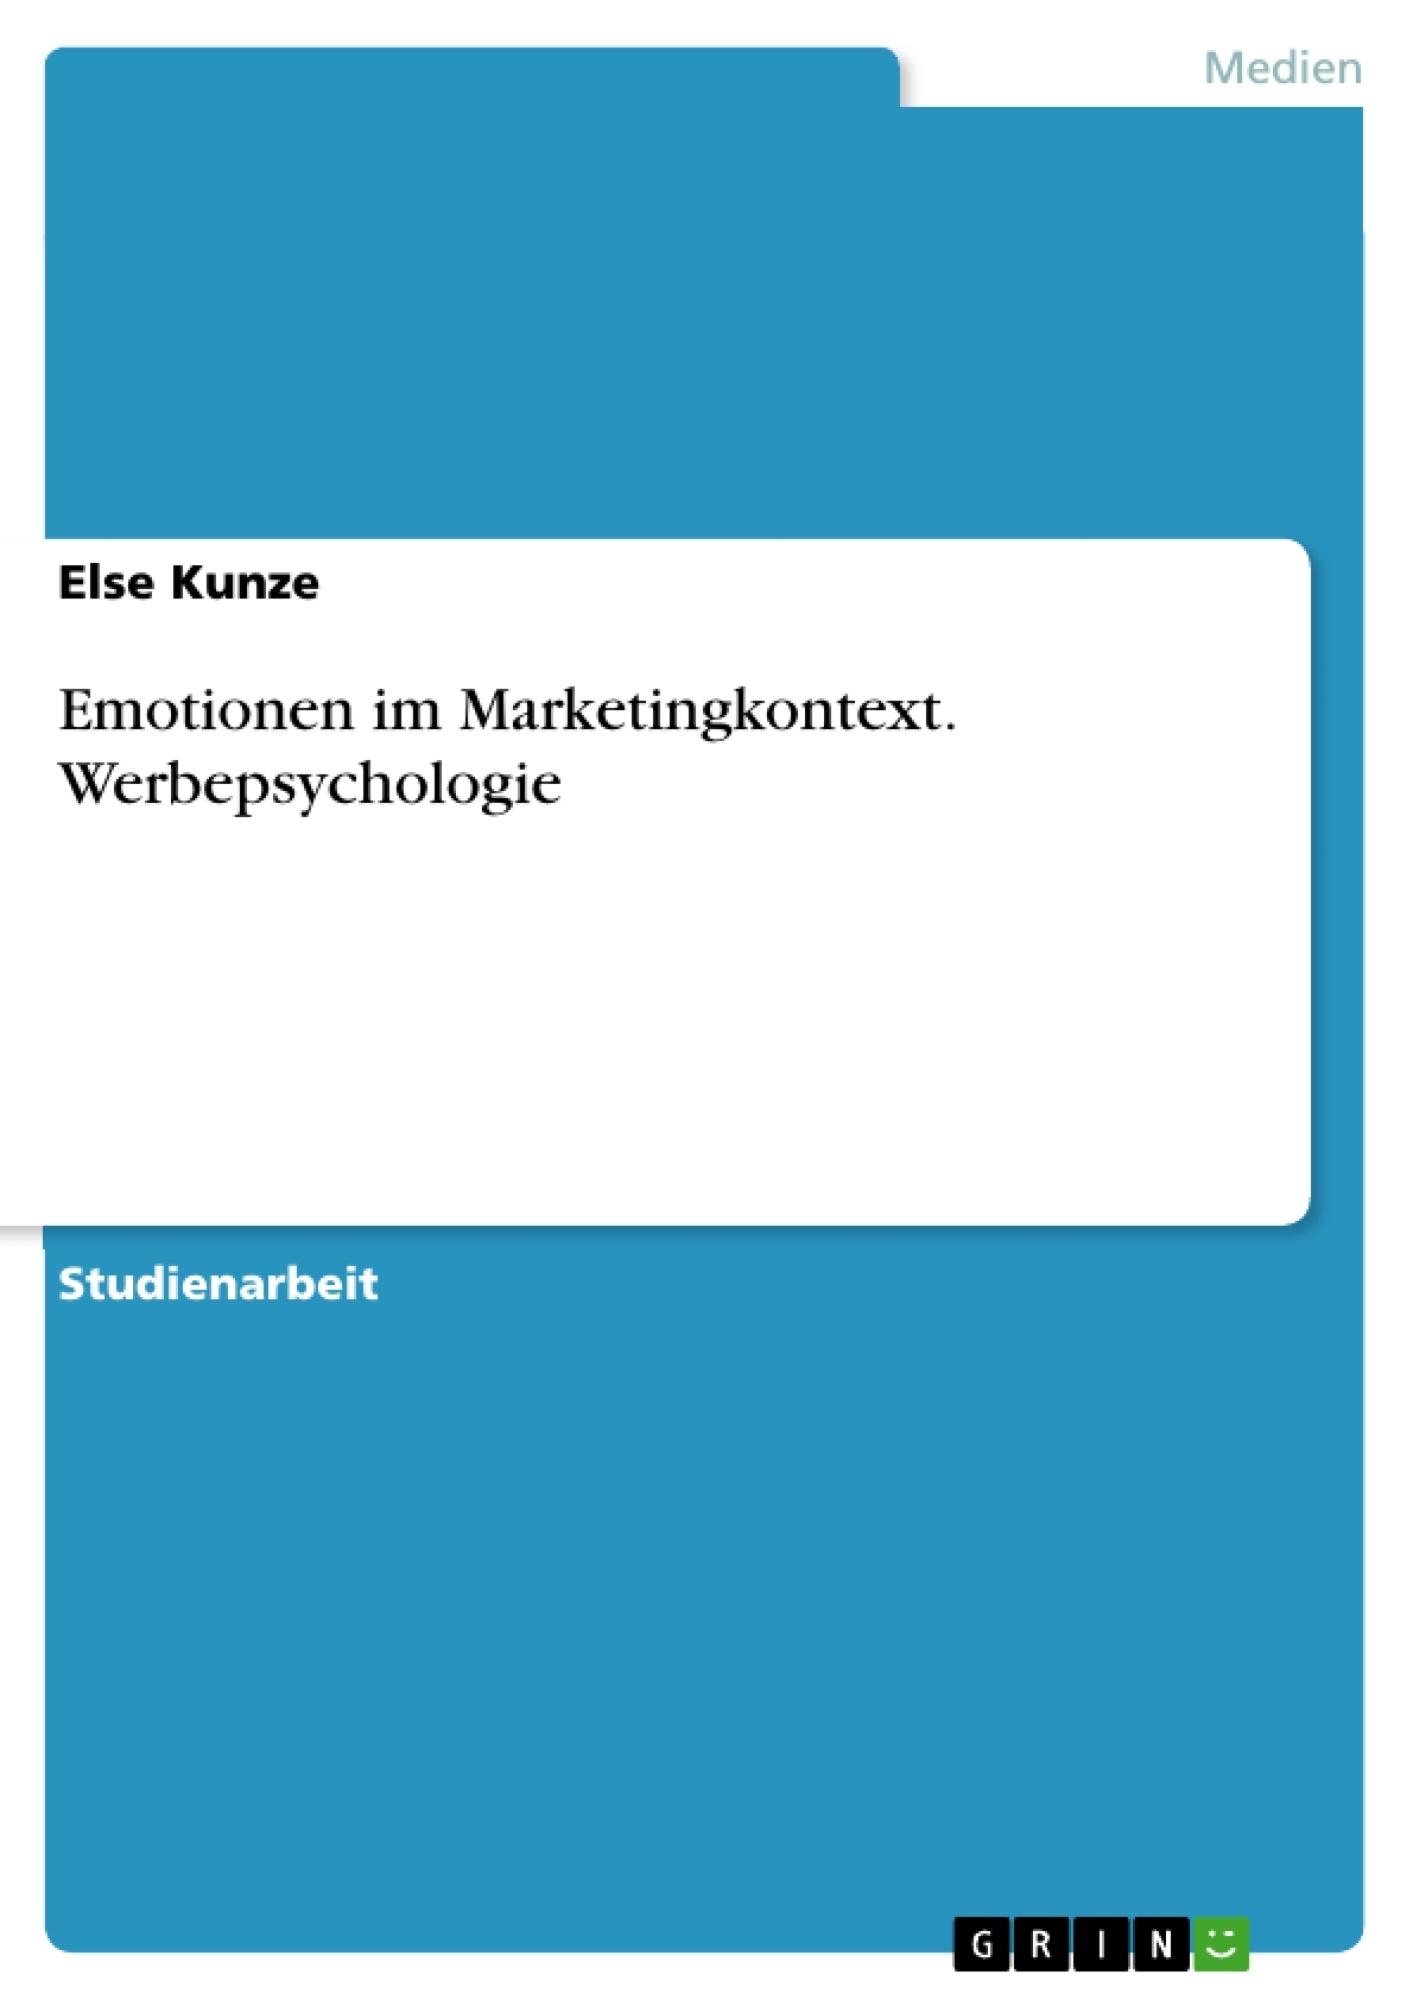 Titel: Emotionen im Marketingkontext. Werbepsychologie